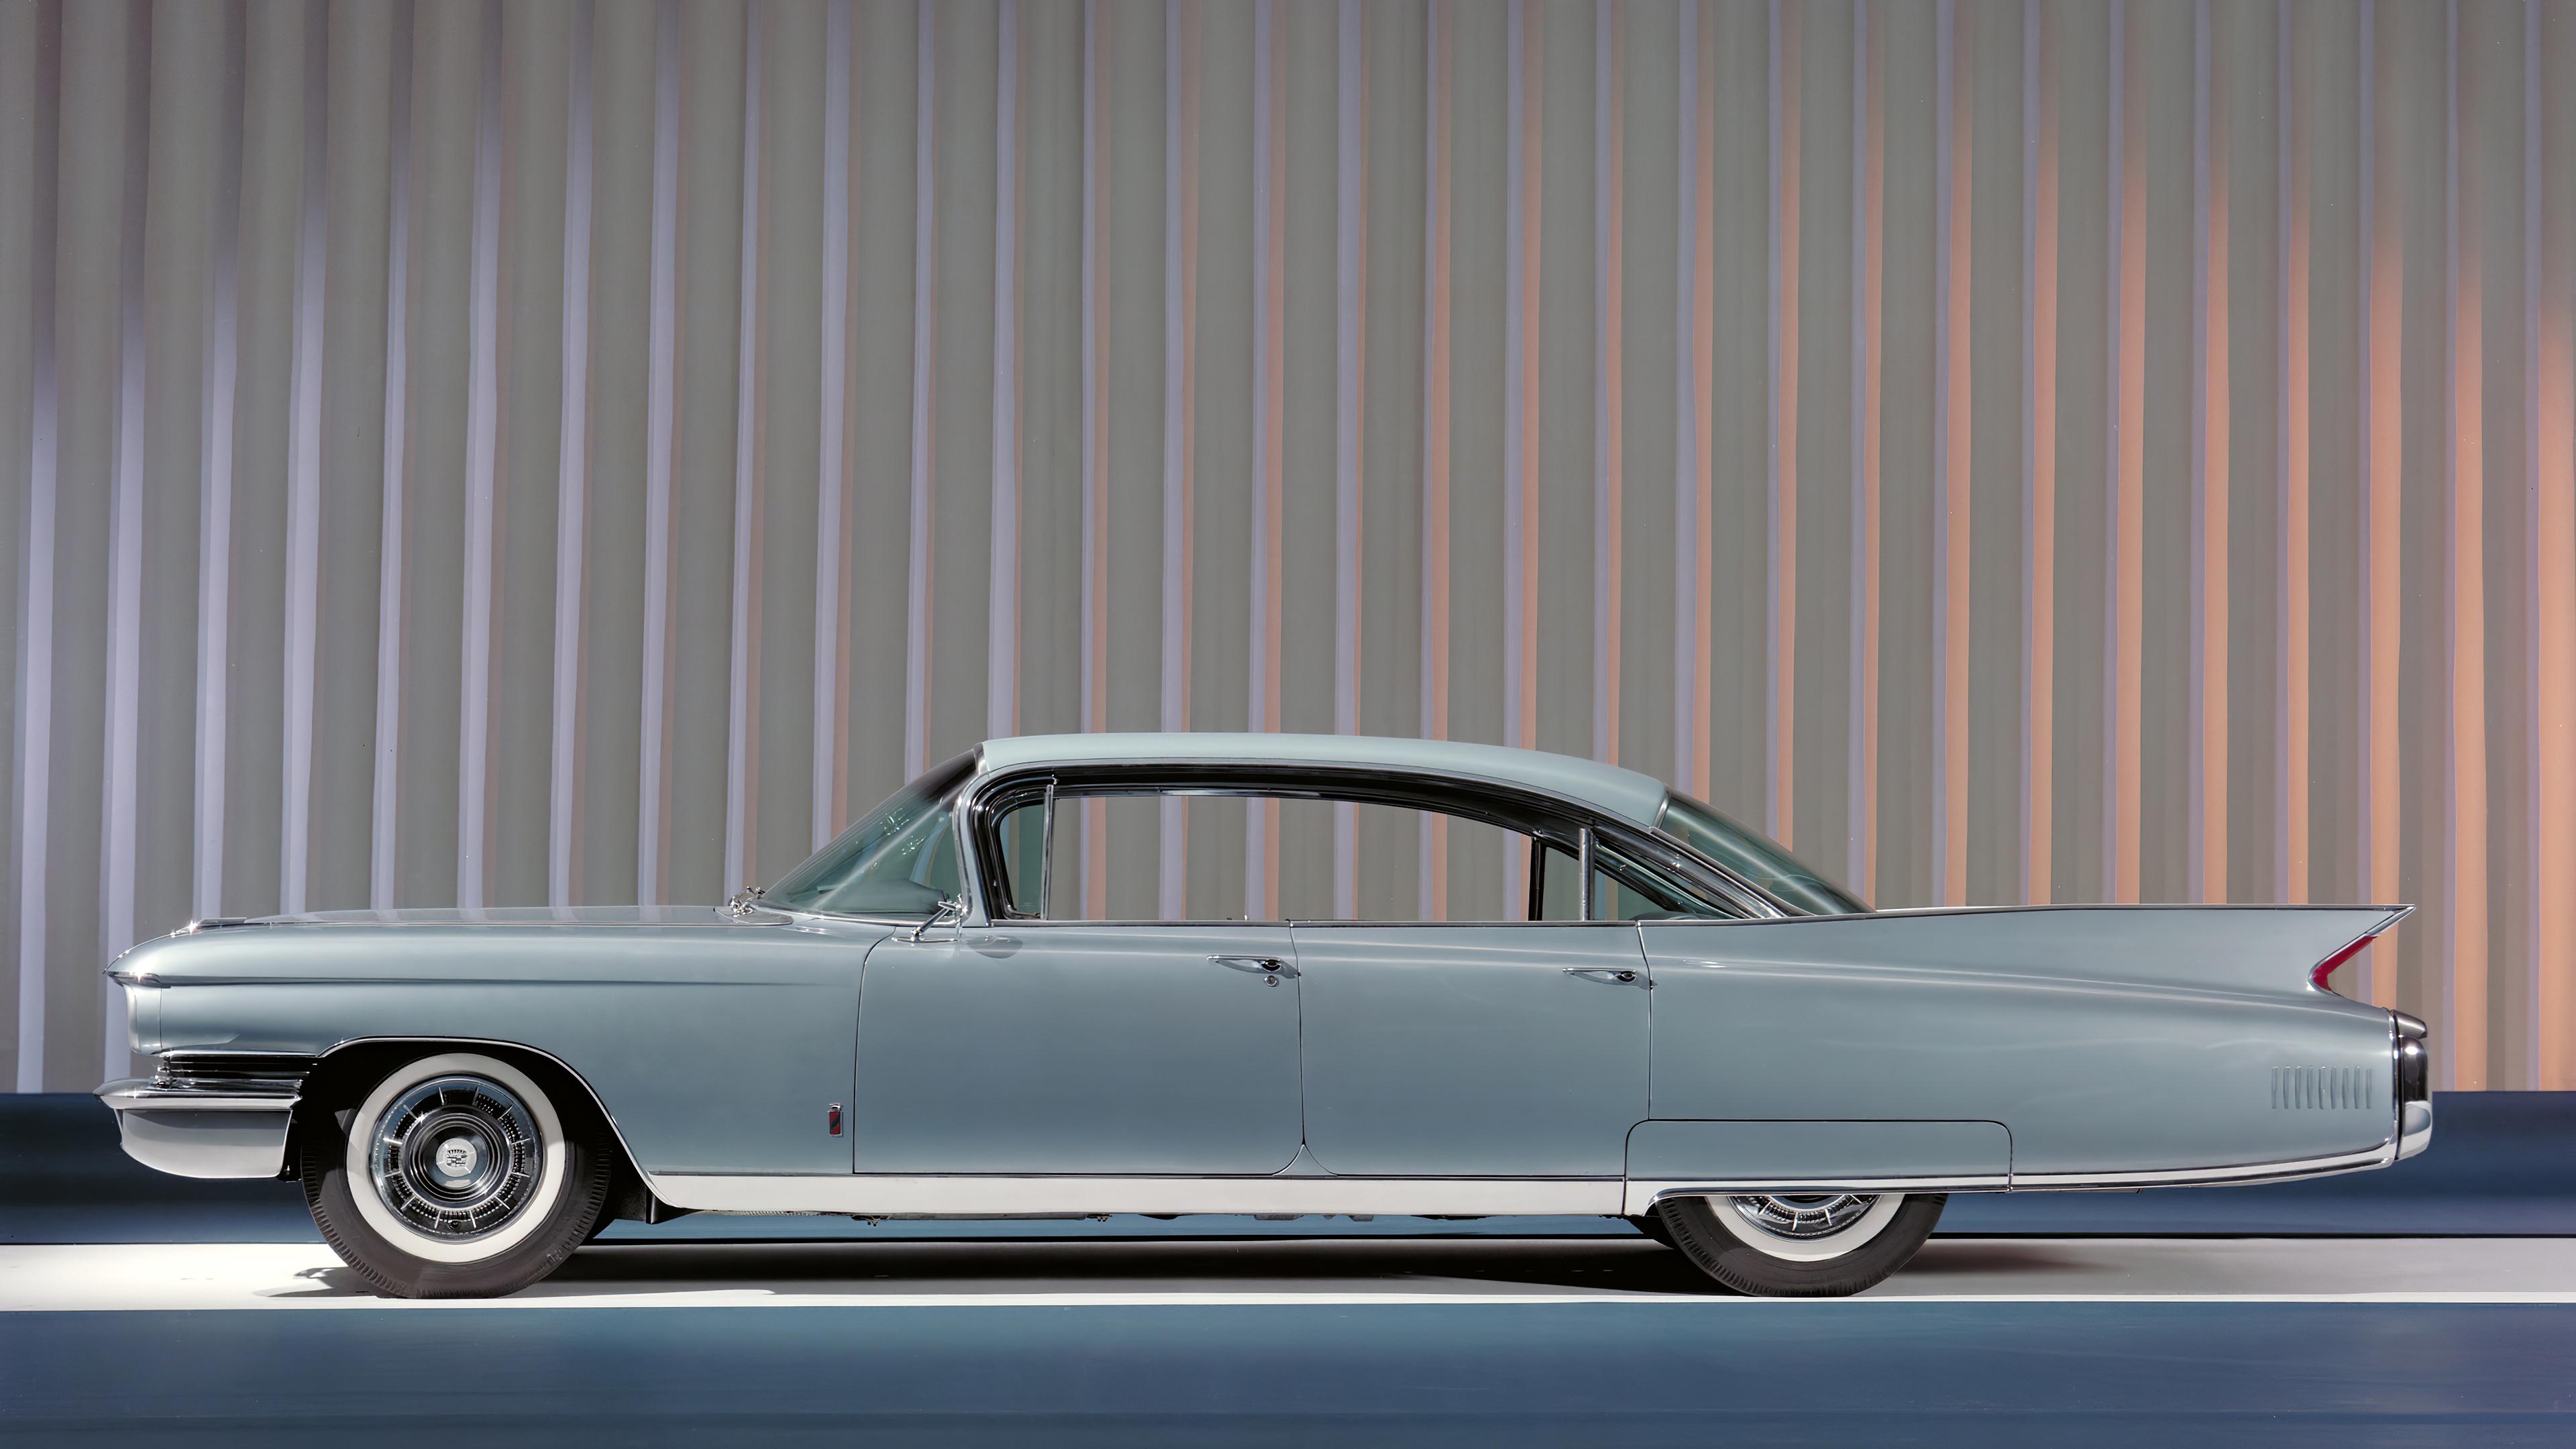 1960 cadillac fleetwood sixty special 1577652740 - 1960 Cadillac Fleetwood Sixty Special - 1960 Cadillac Fleetwood 4k wallpaper, 1960 Cadillac 4k wallpaper